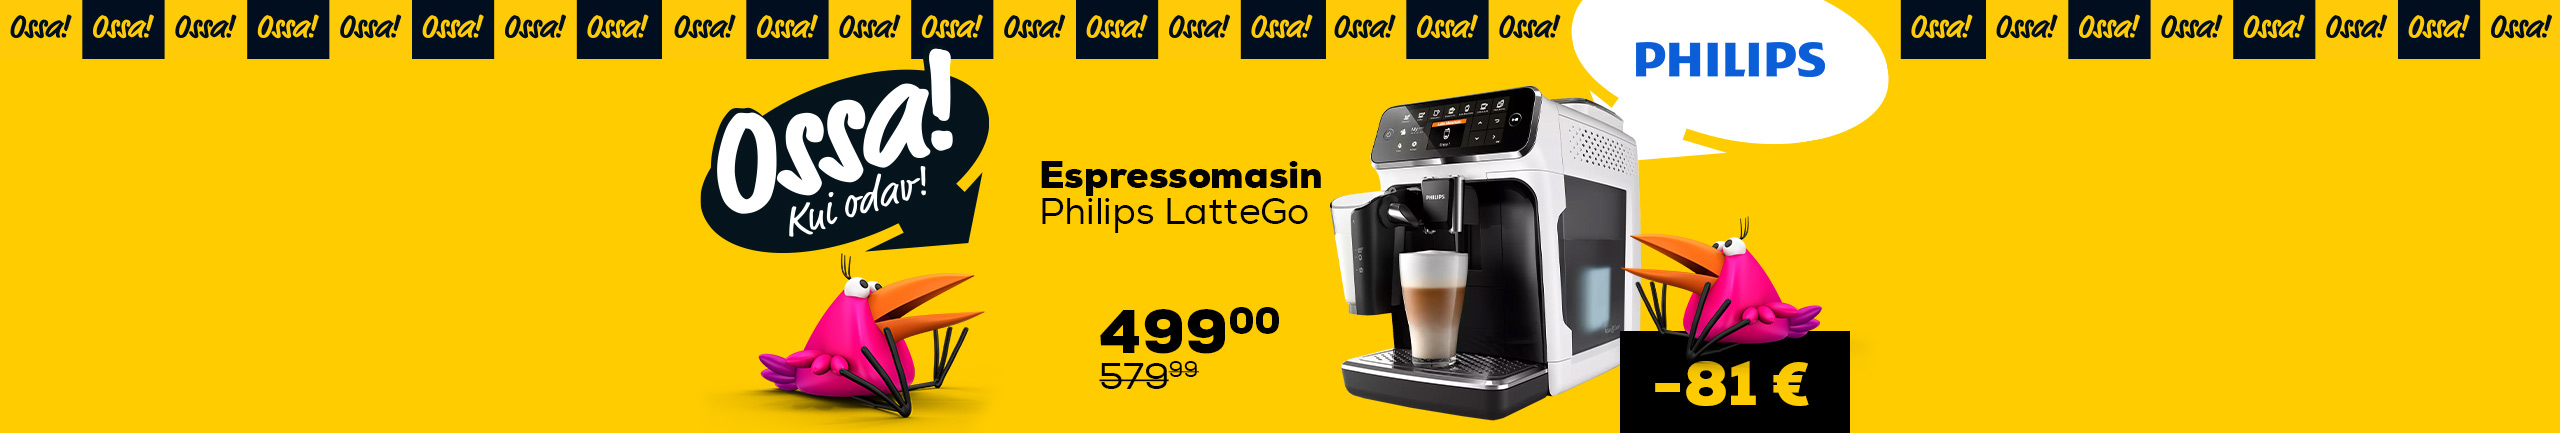 NPL Ossa! Summer 2021 Espresso machine Philips LatteGo